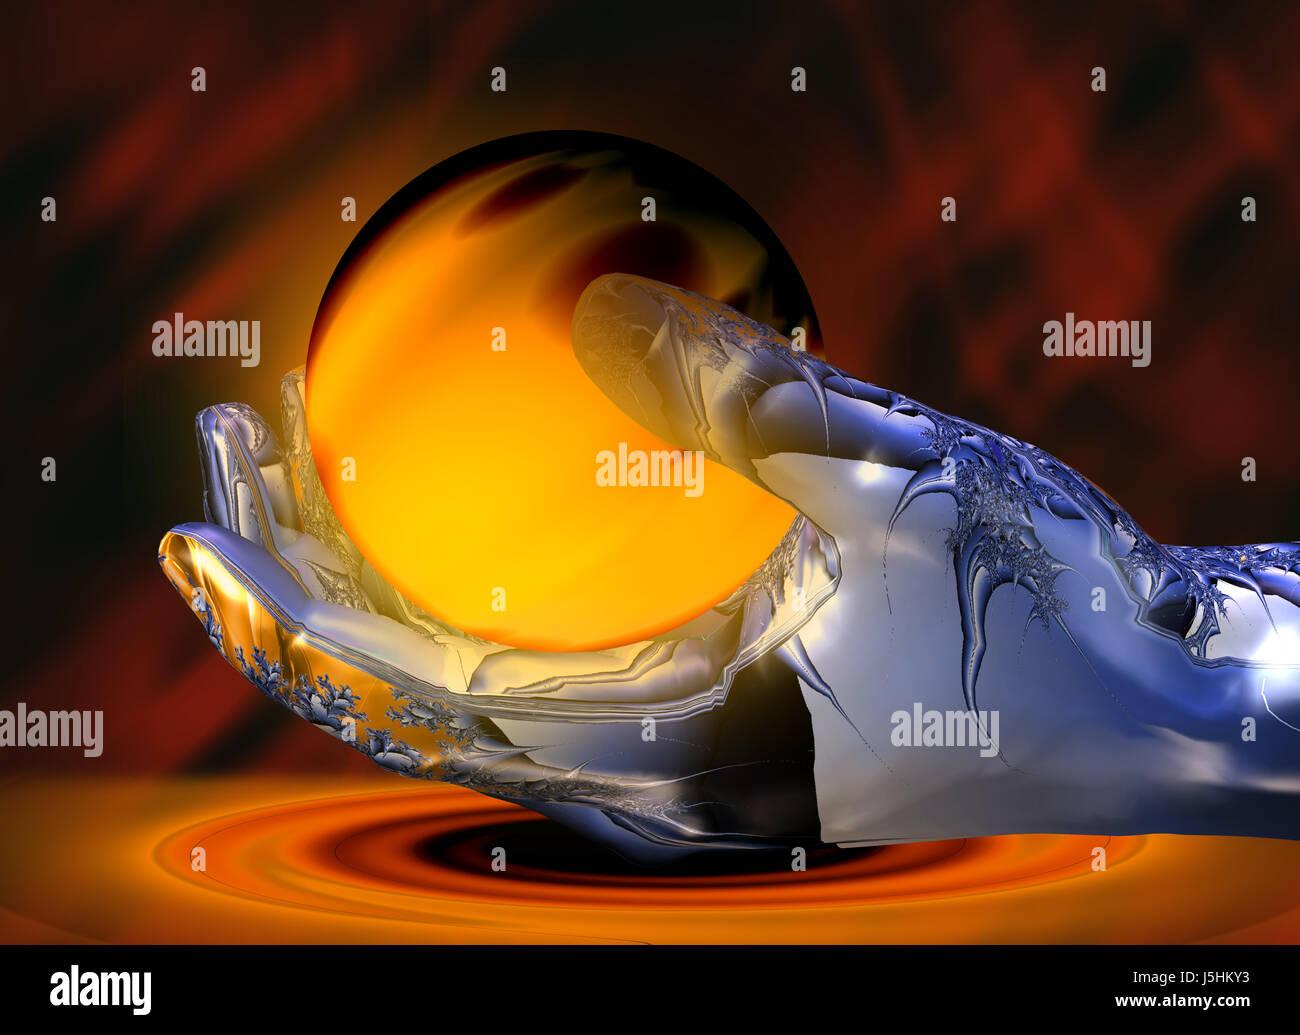 Blue Hand Finger Art Fantasy Heat Abstract Lava Web Design